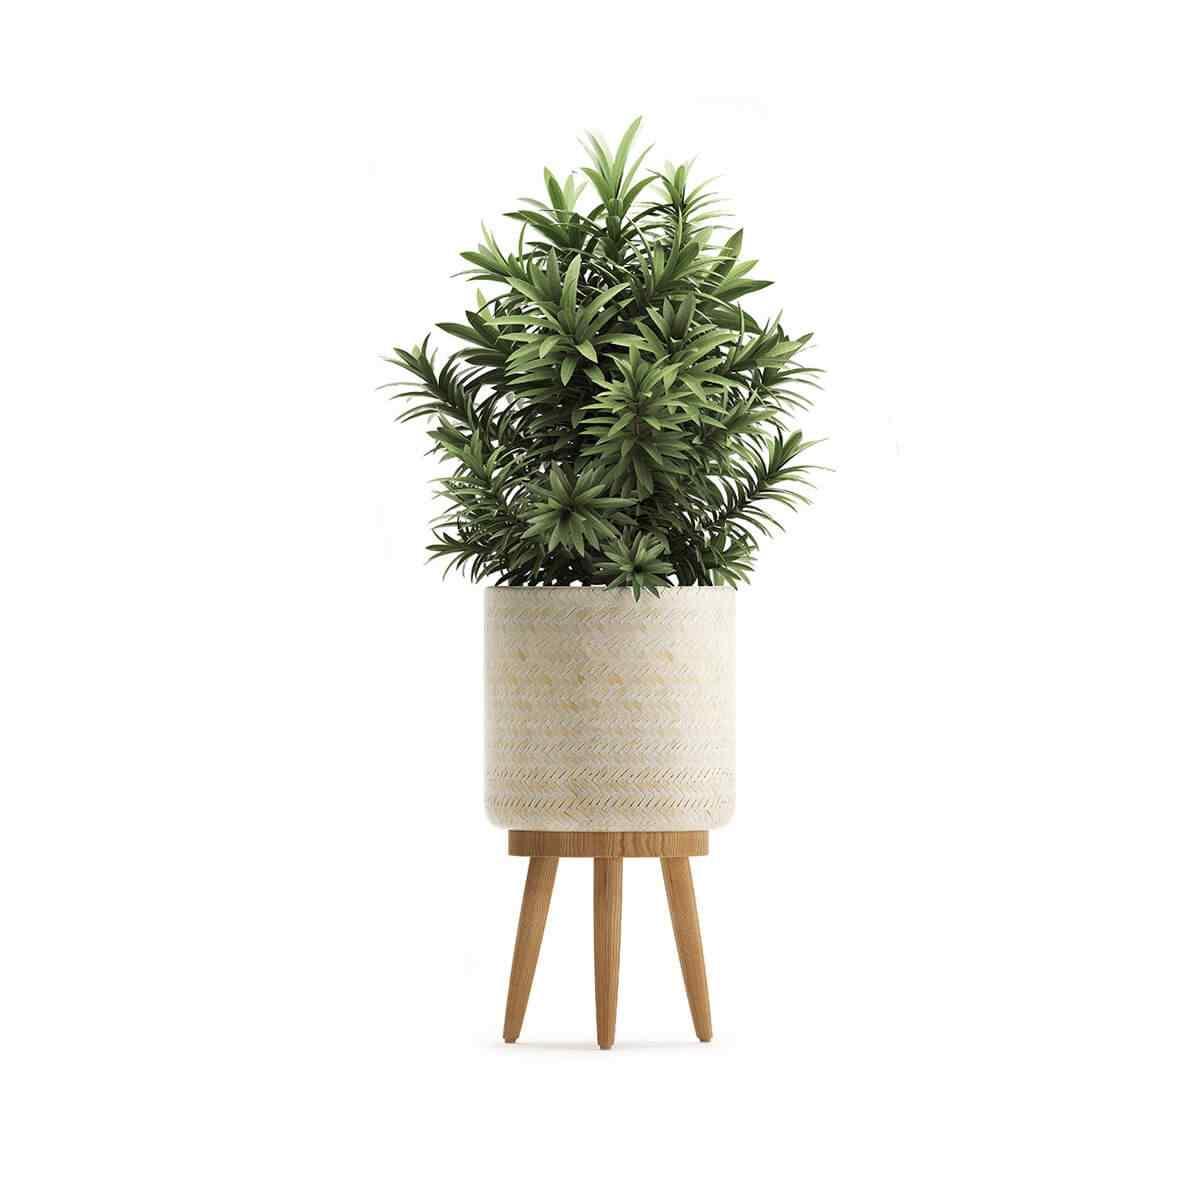 https://www.jardineriasur.cl/wp-content/uploads/2018/09/product_08.jpg